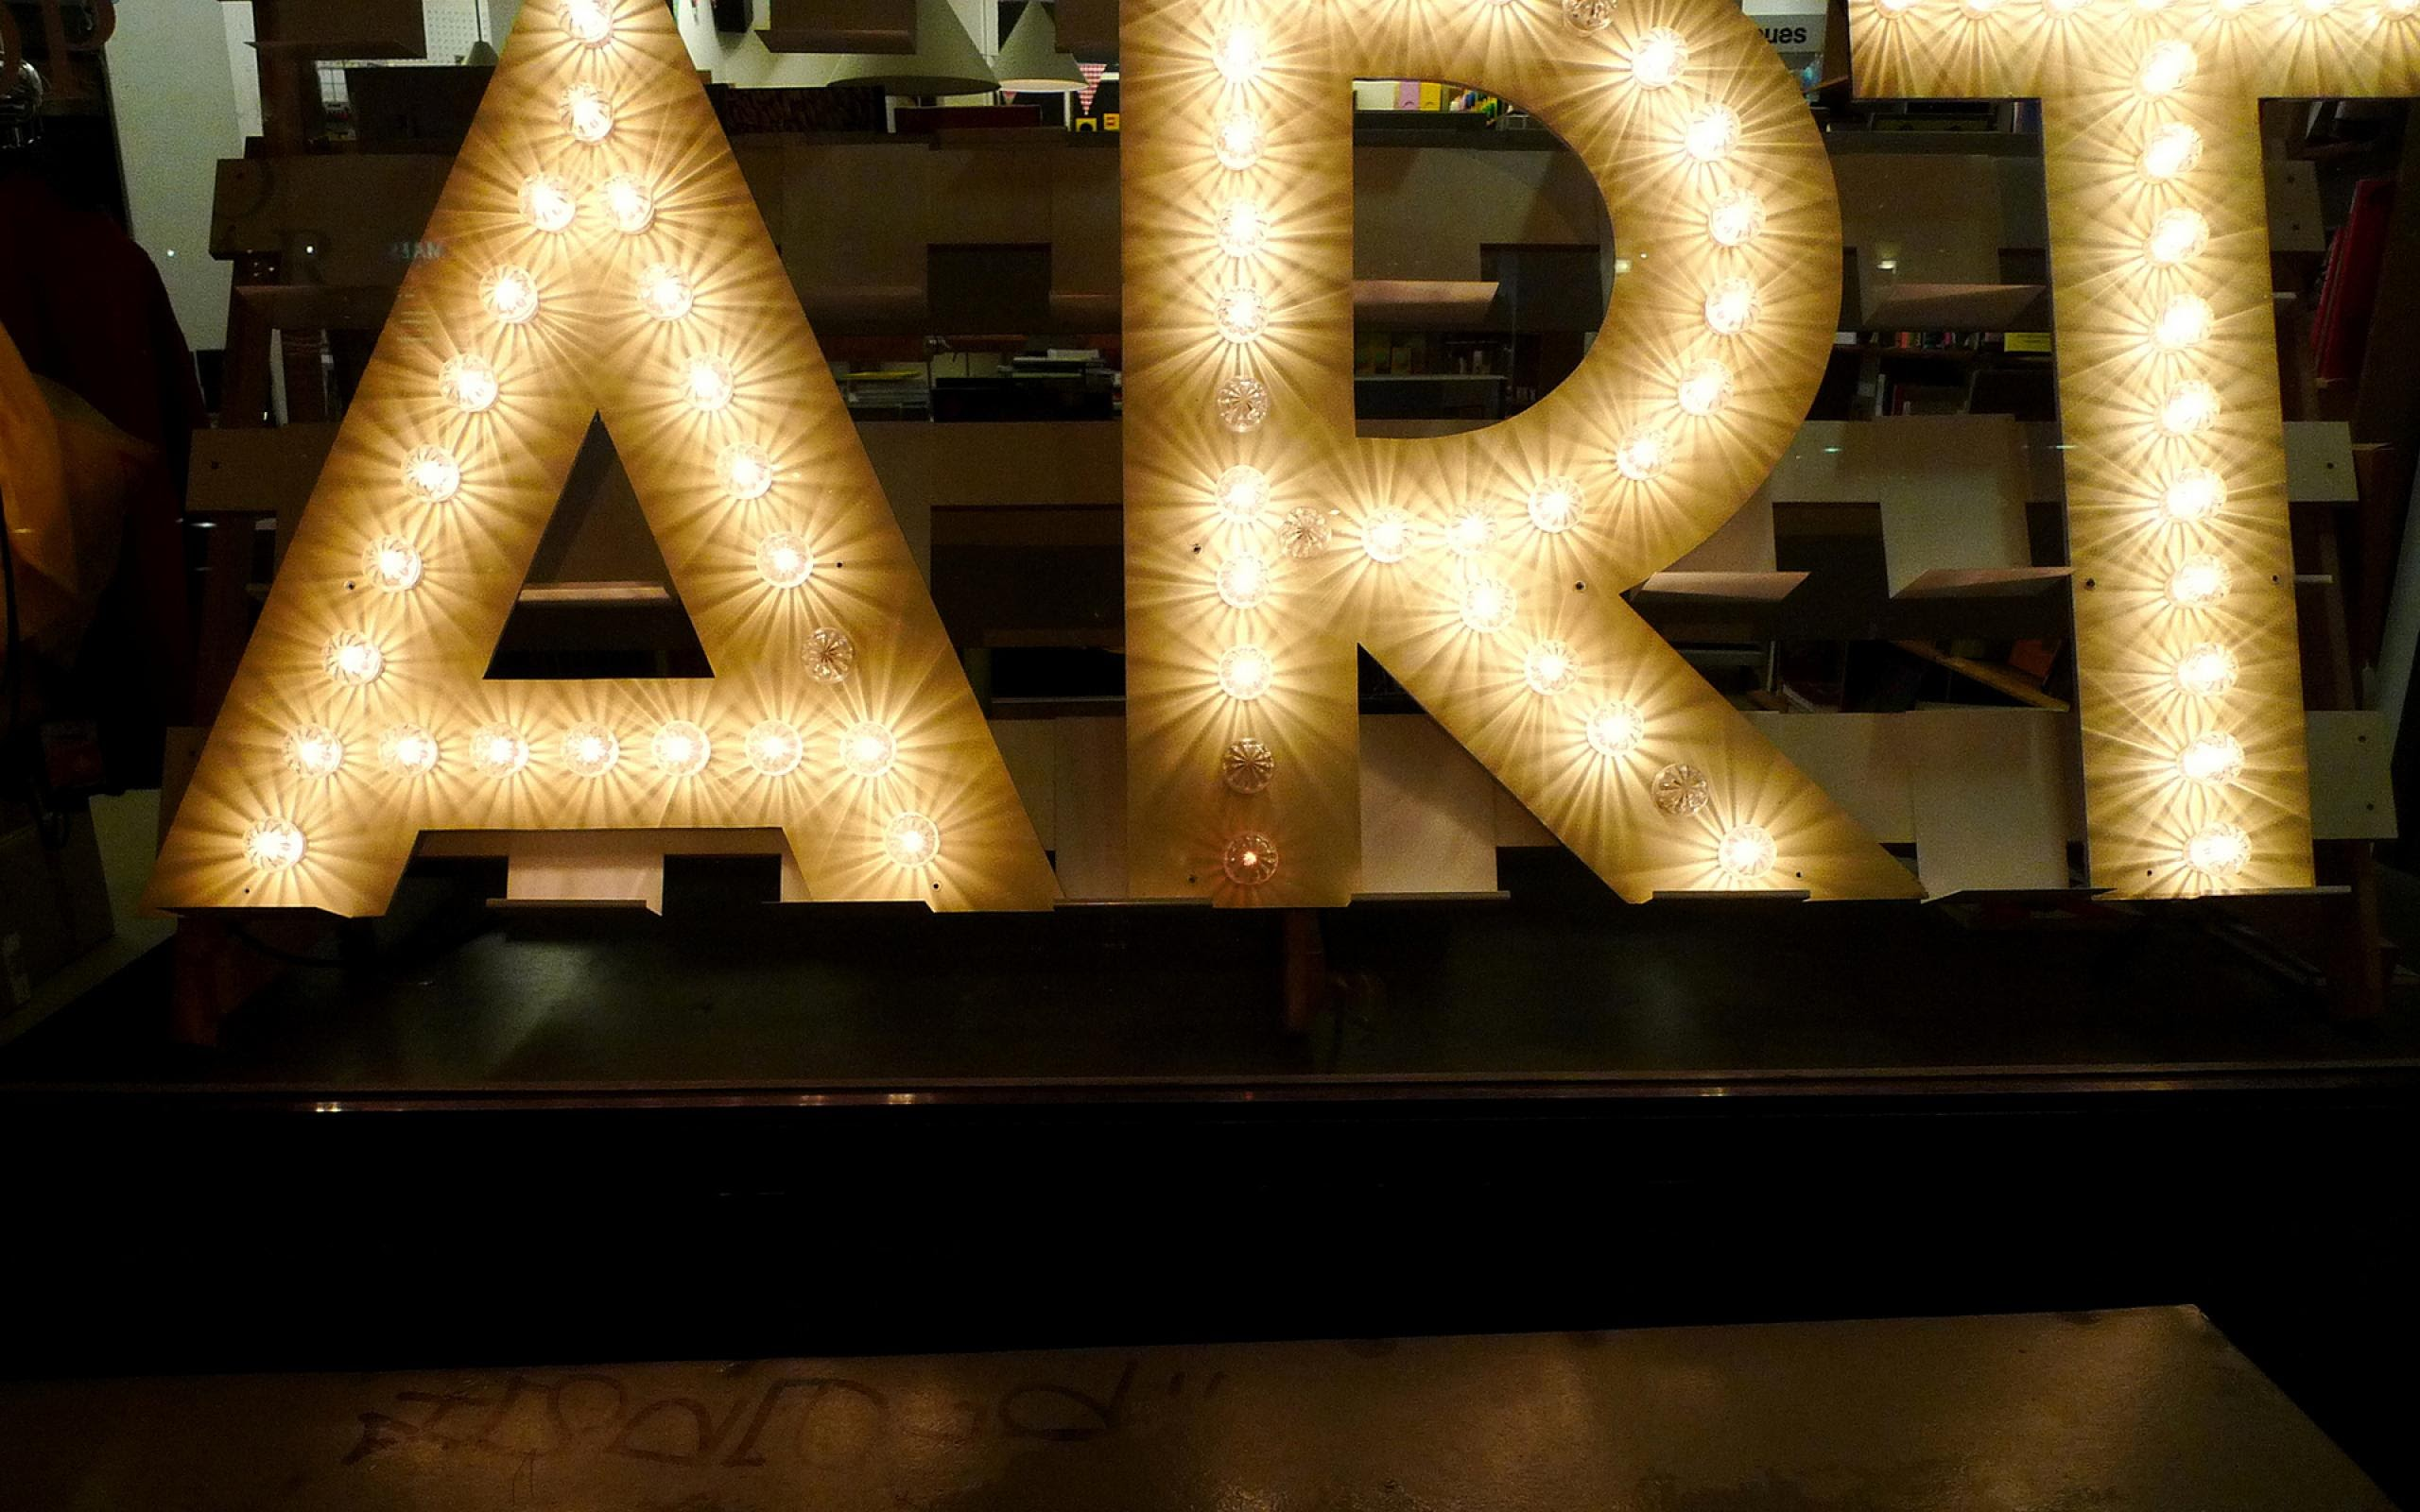 art-sign-light-bulb-wallpaper-1 (1)